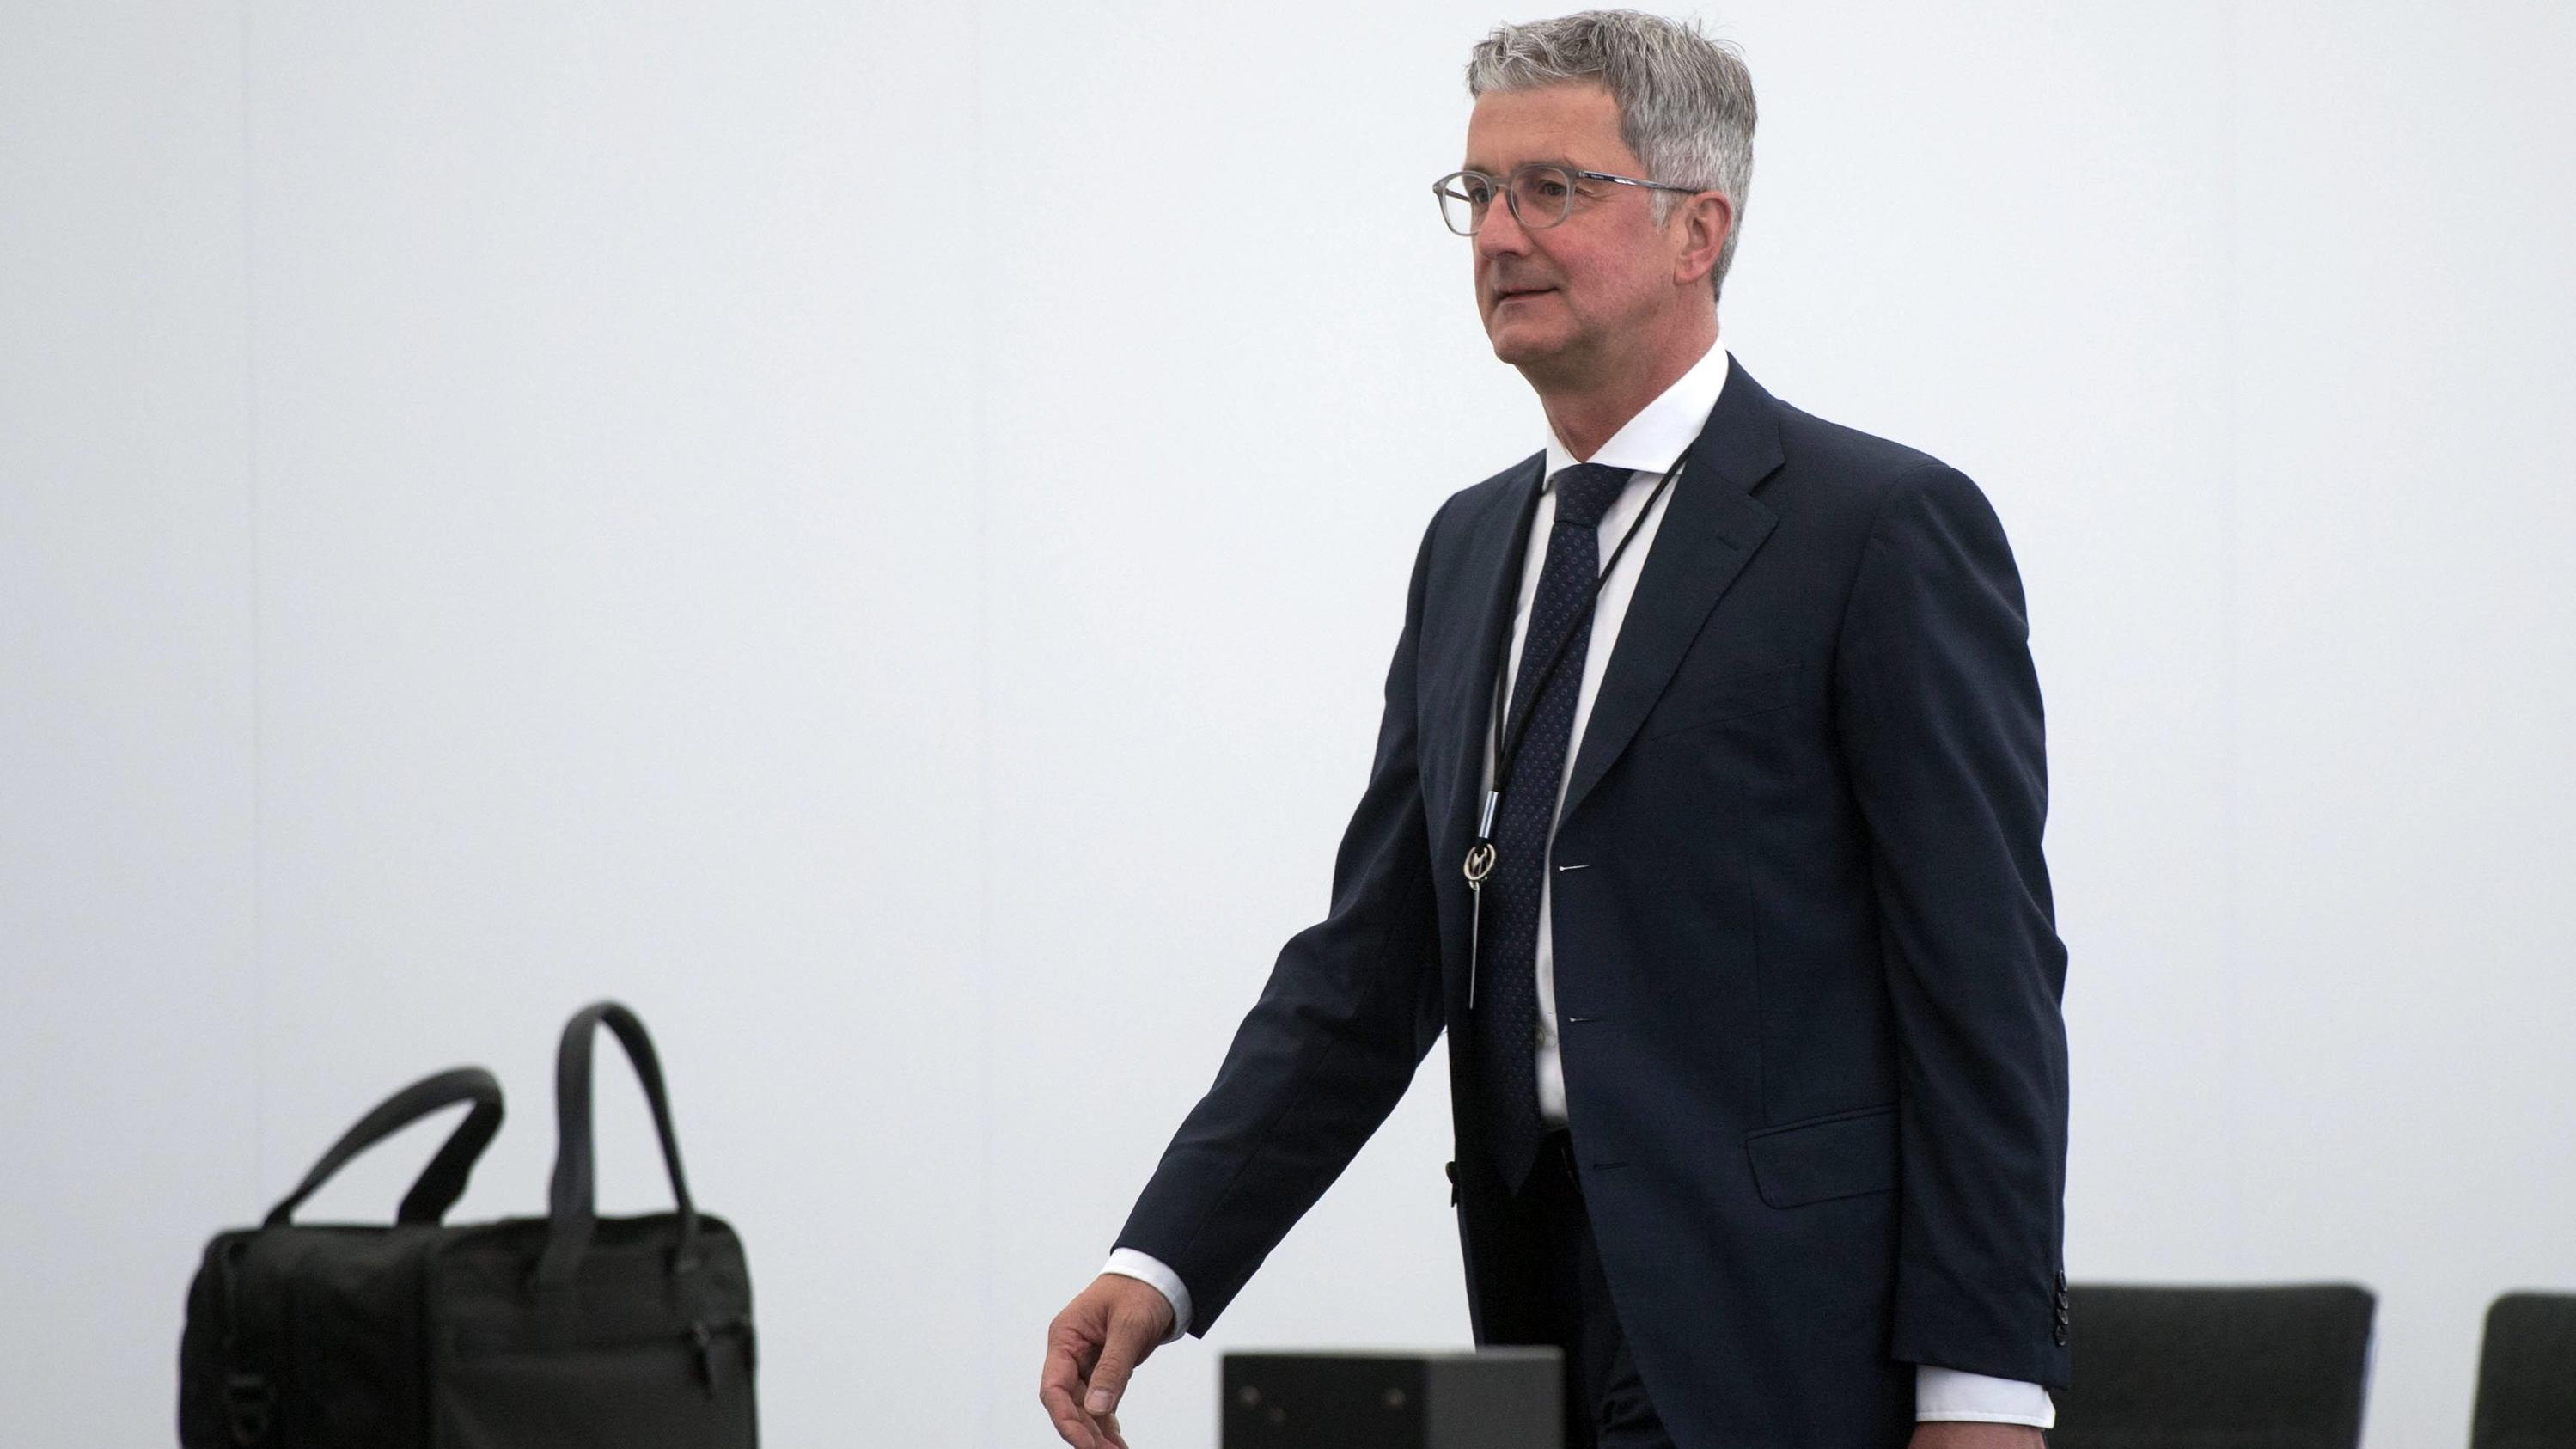 Der ehemalige Vorstandsvorsitzende der Audi AG Rupert Stadler